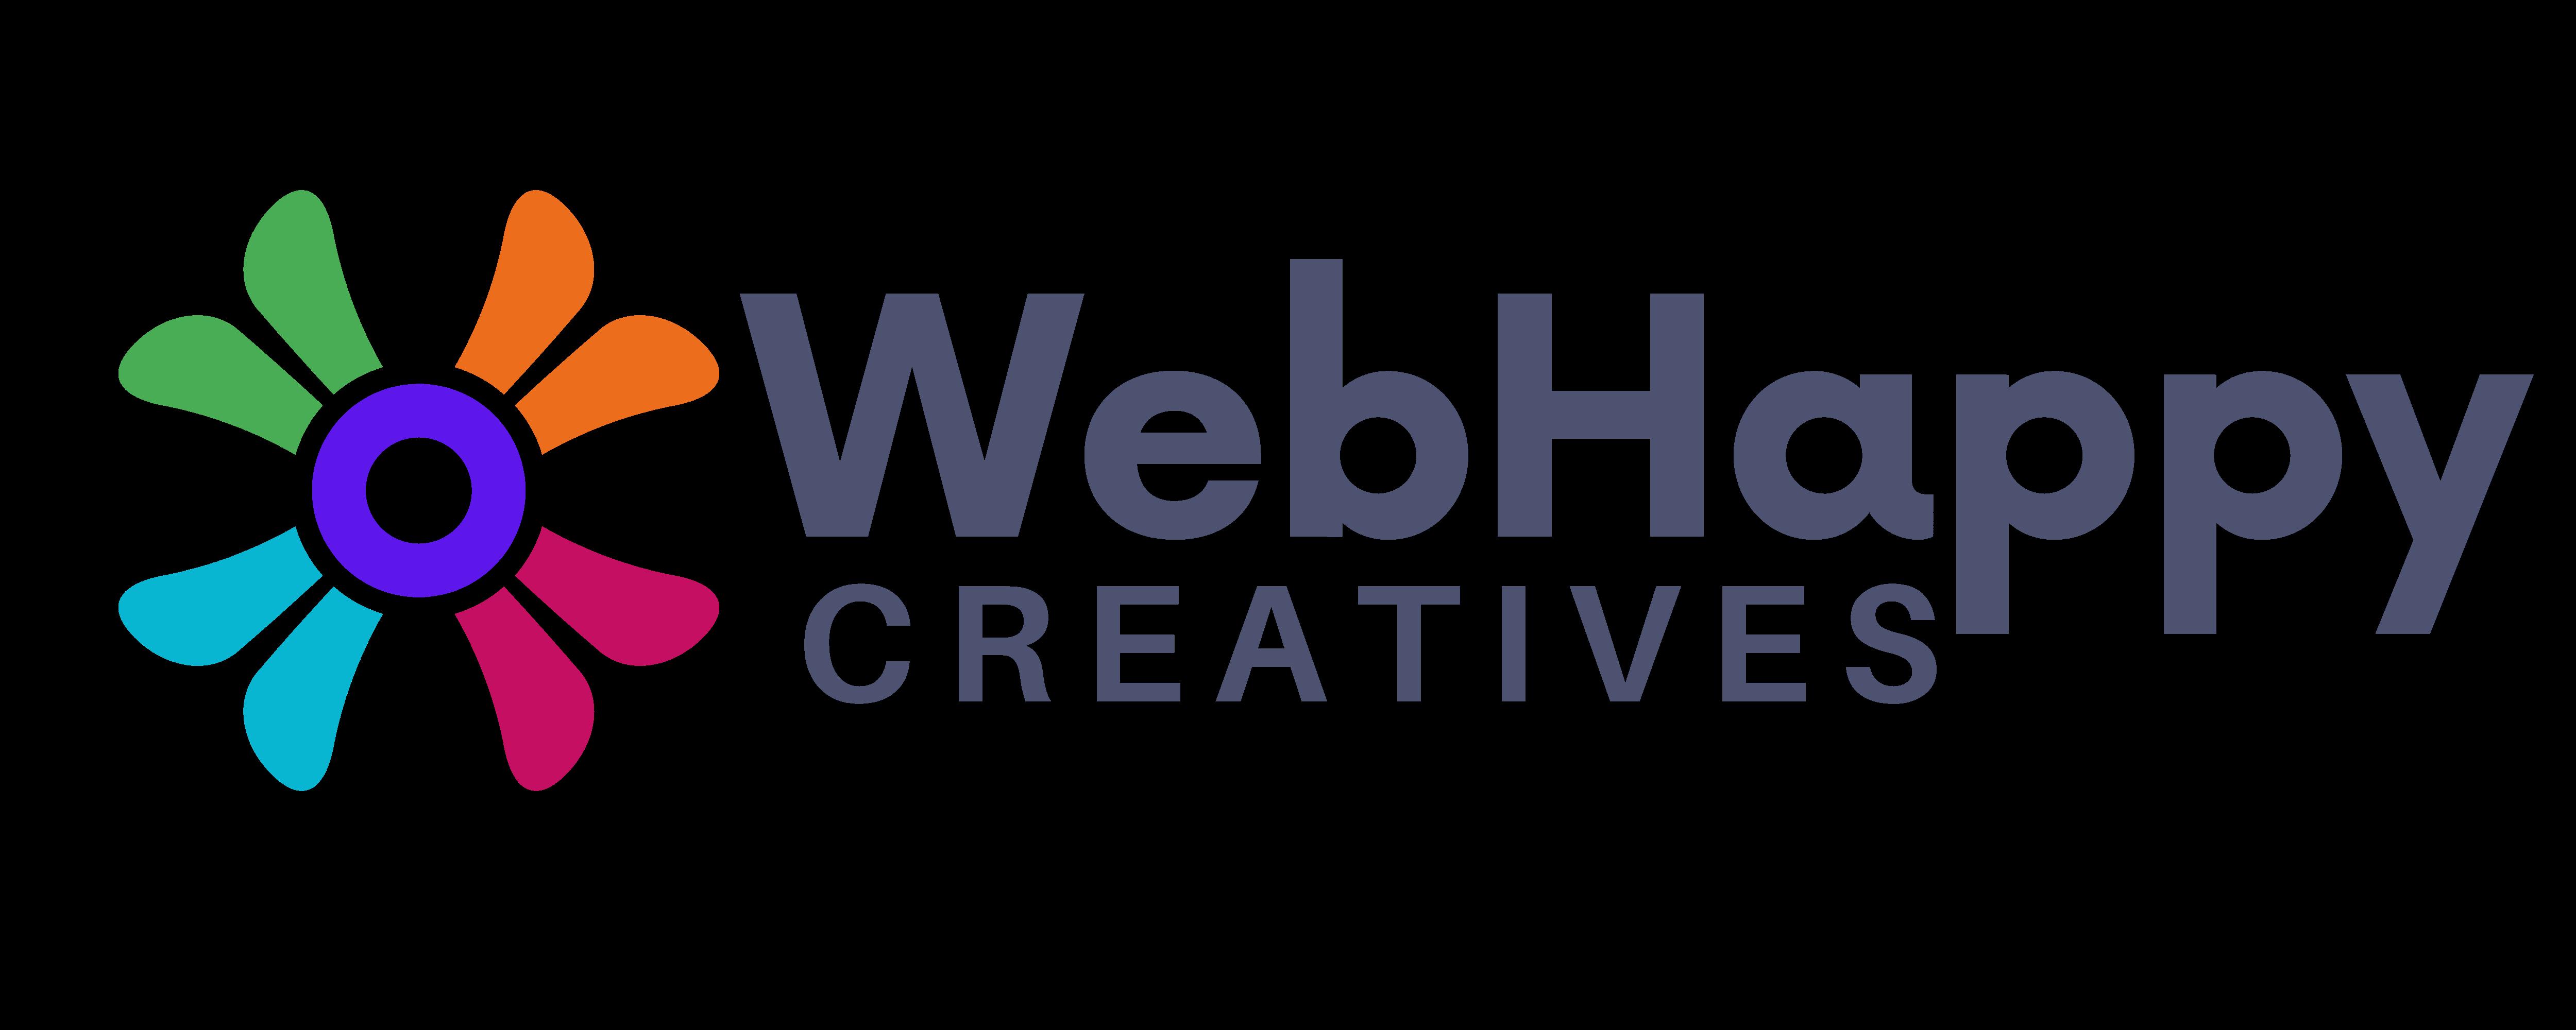 WebHappy Creatives